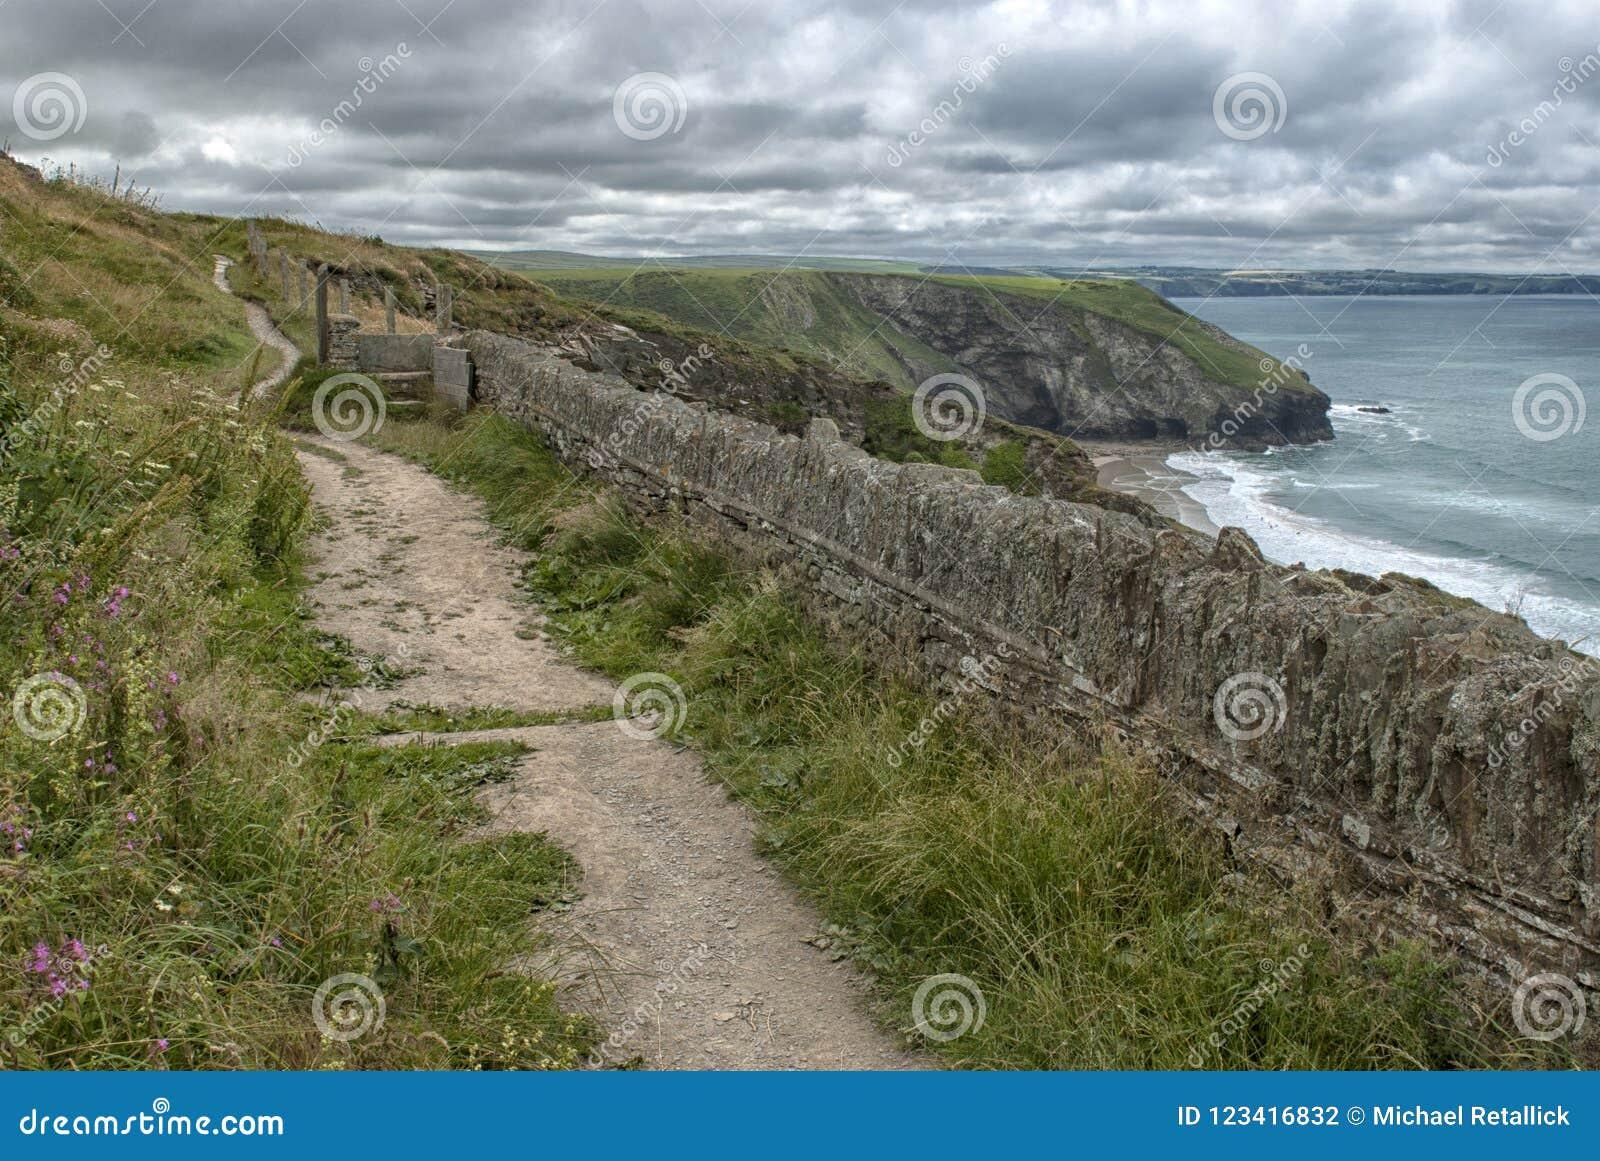 Coastal Path on the North Coast of Cornwall